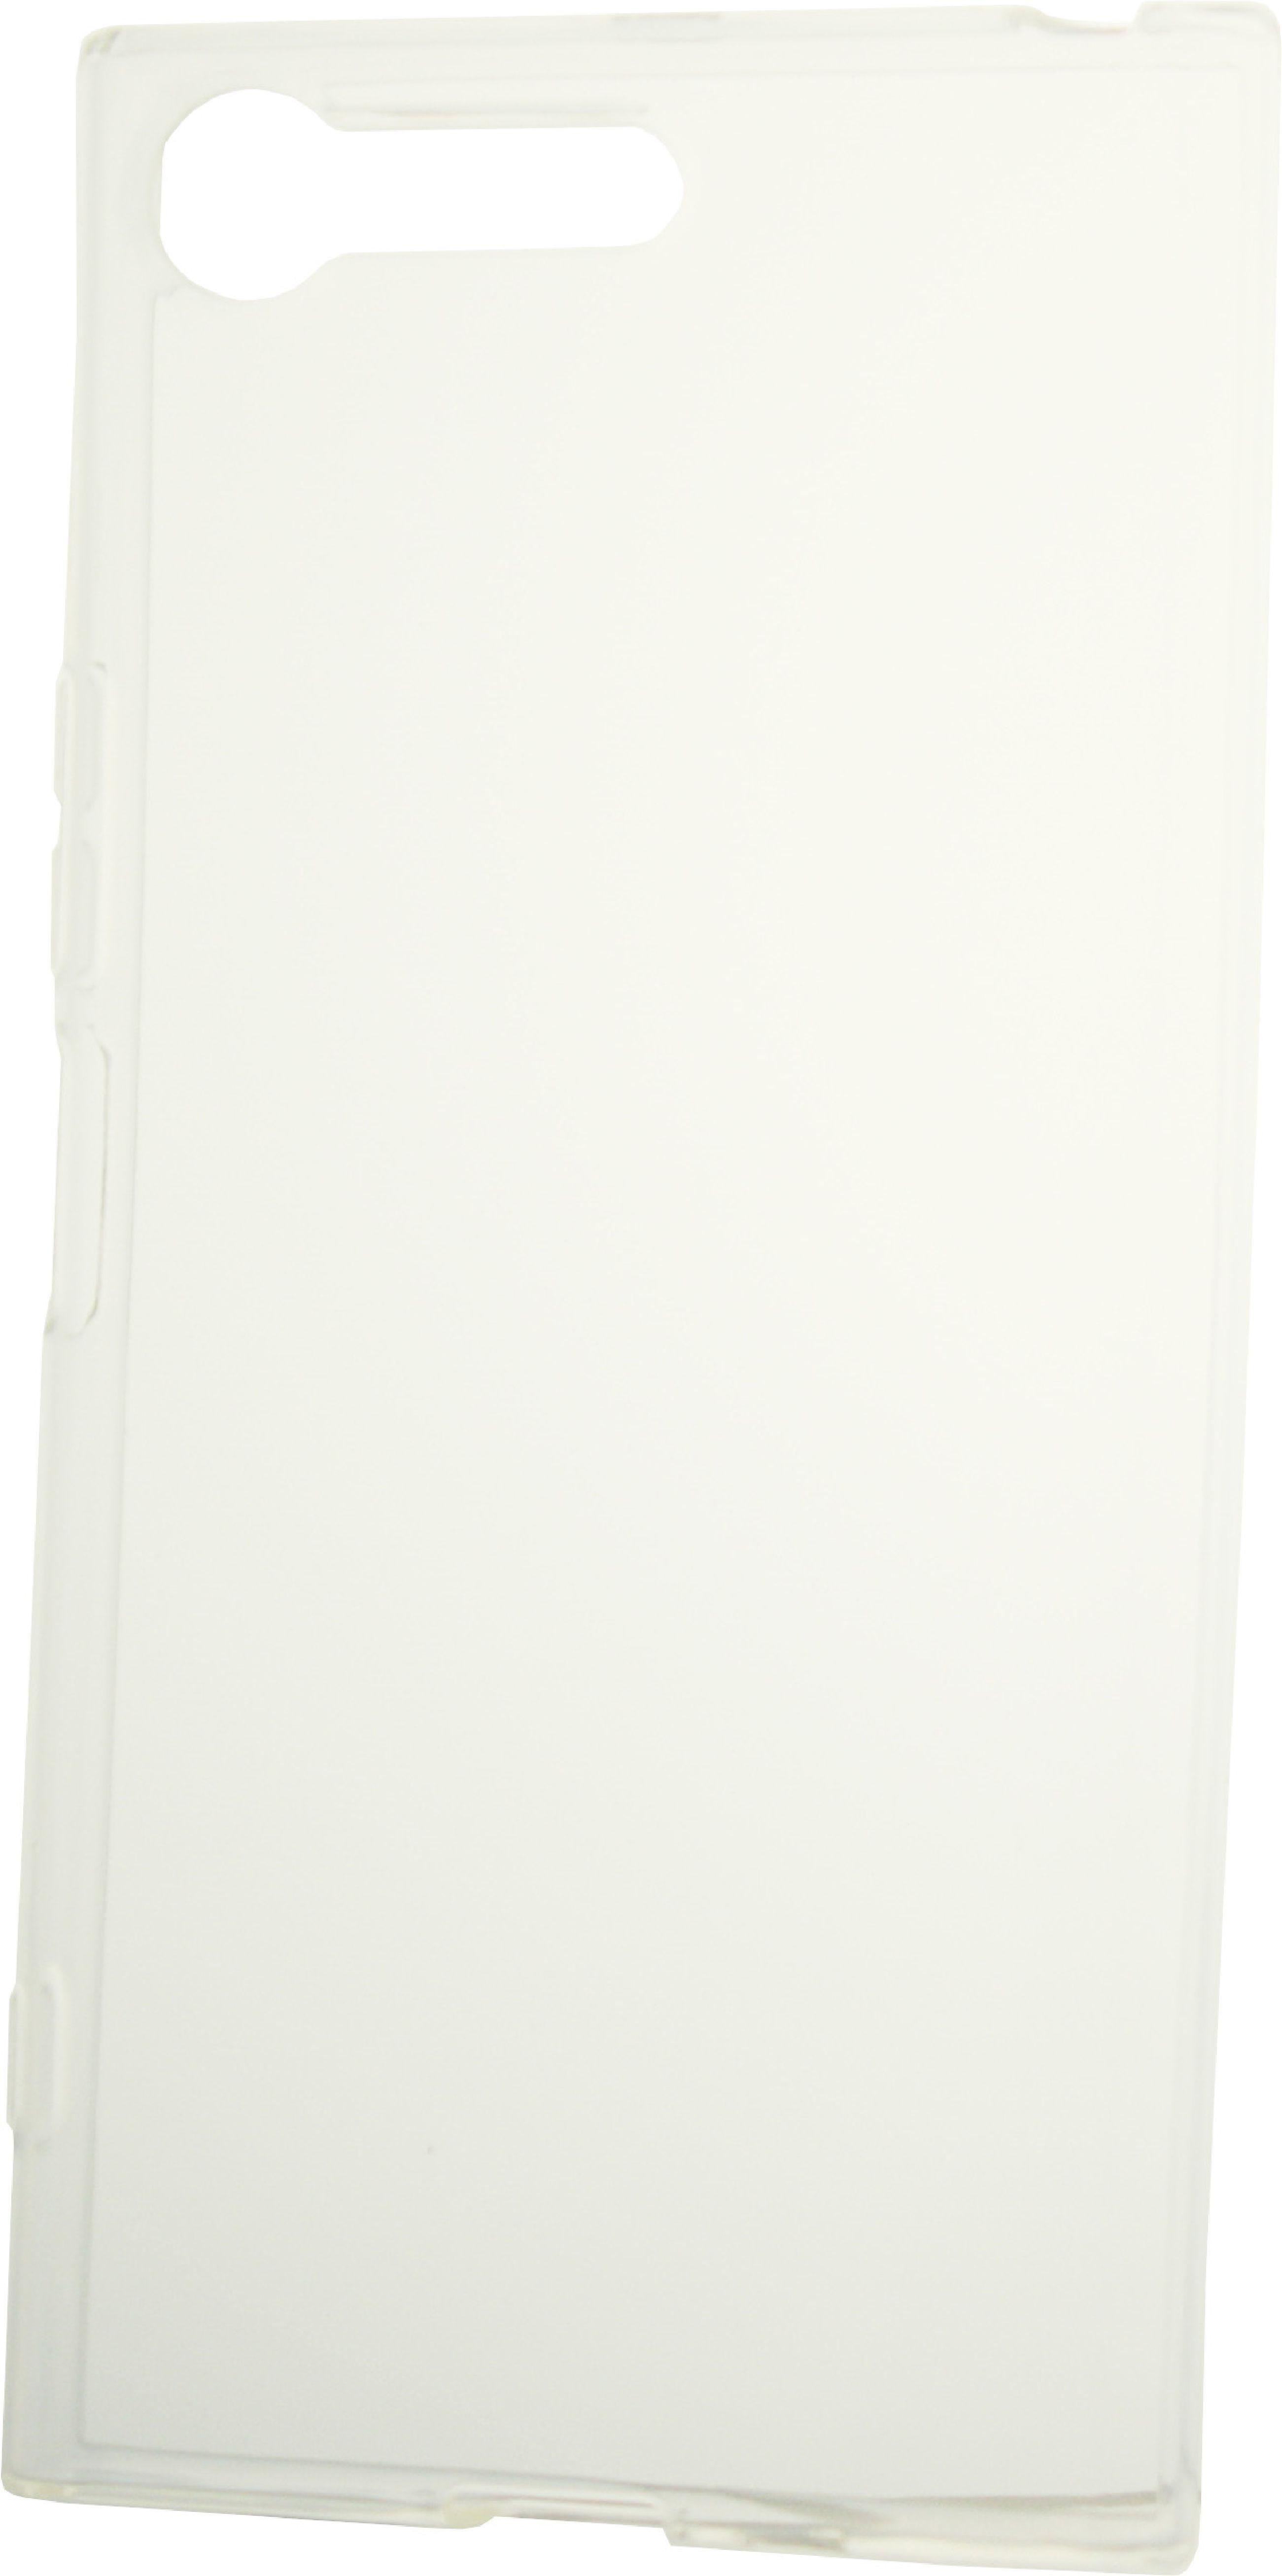 Image of   Telefon Gel-Etui Sony Xperia XZ Premium Gennemsigtig